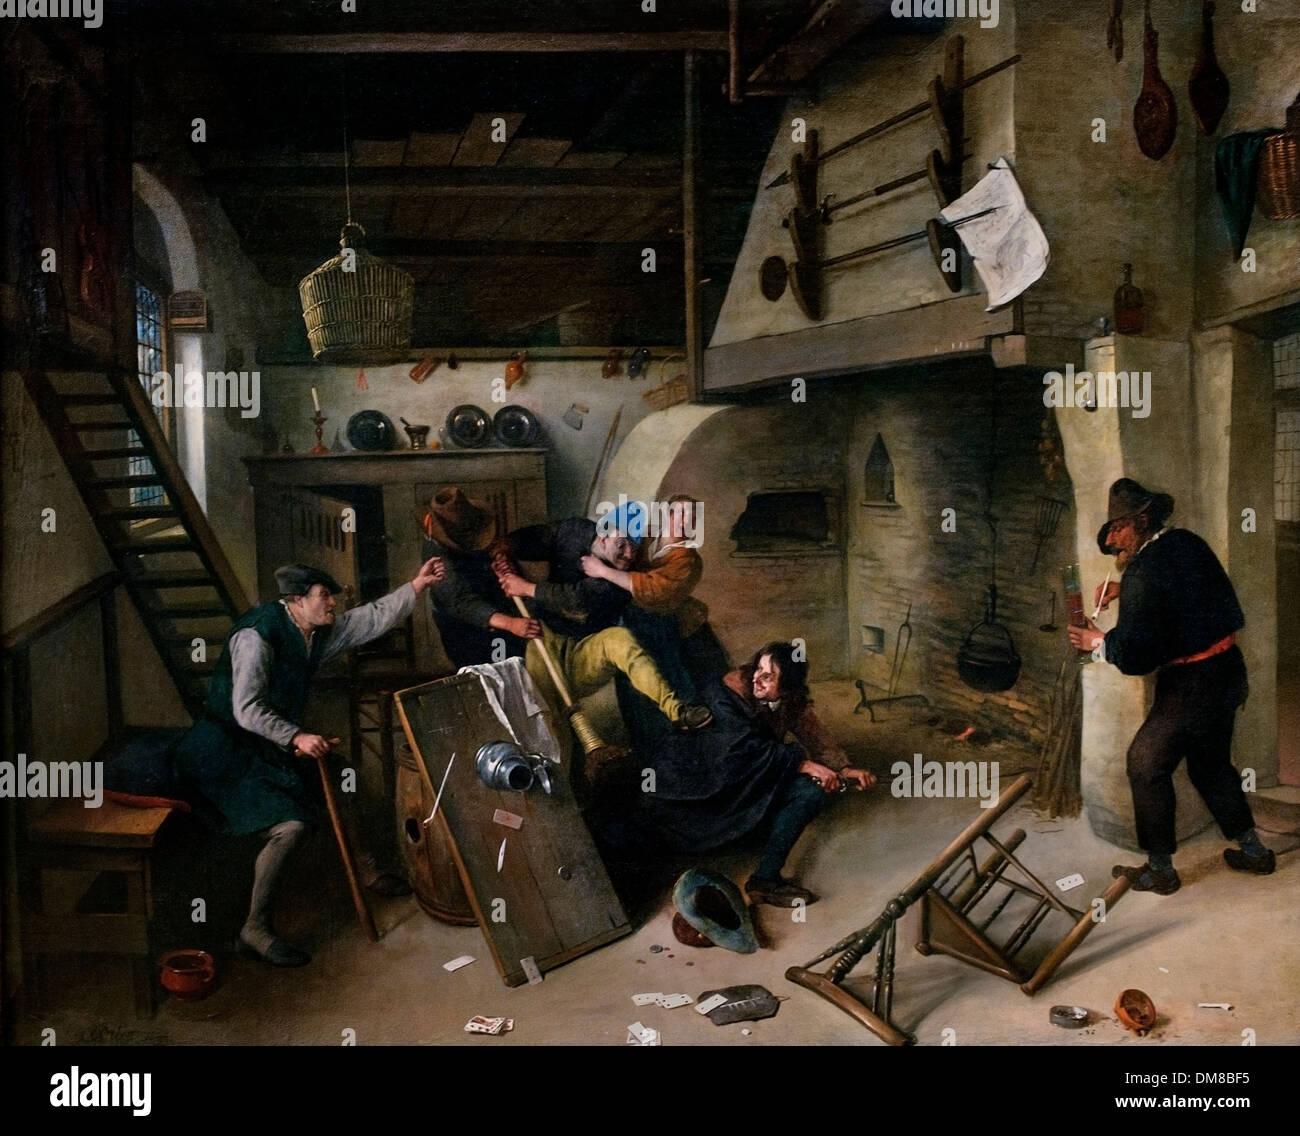 Fight between card players in a tavern Jan Havicksz Steen 1626 - 1679  Dutch Netherlands - Stock Image